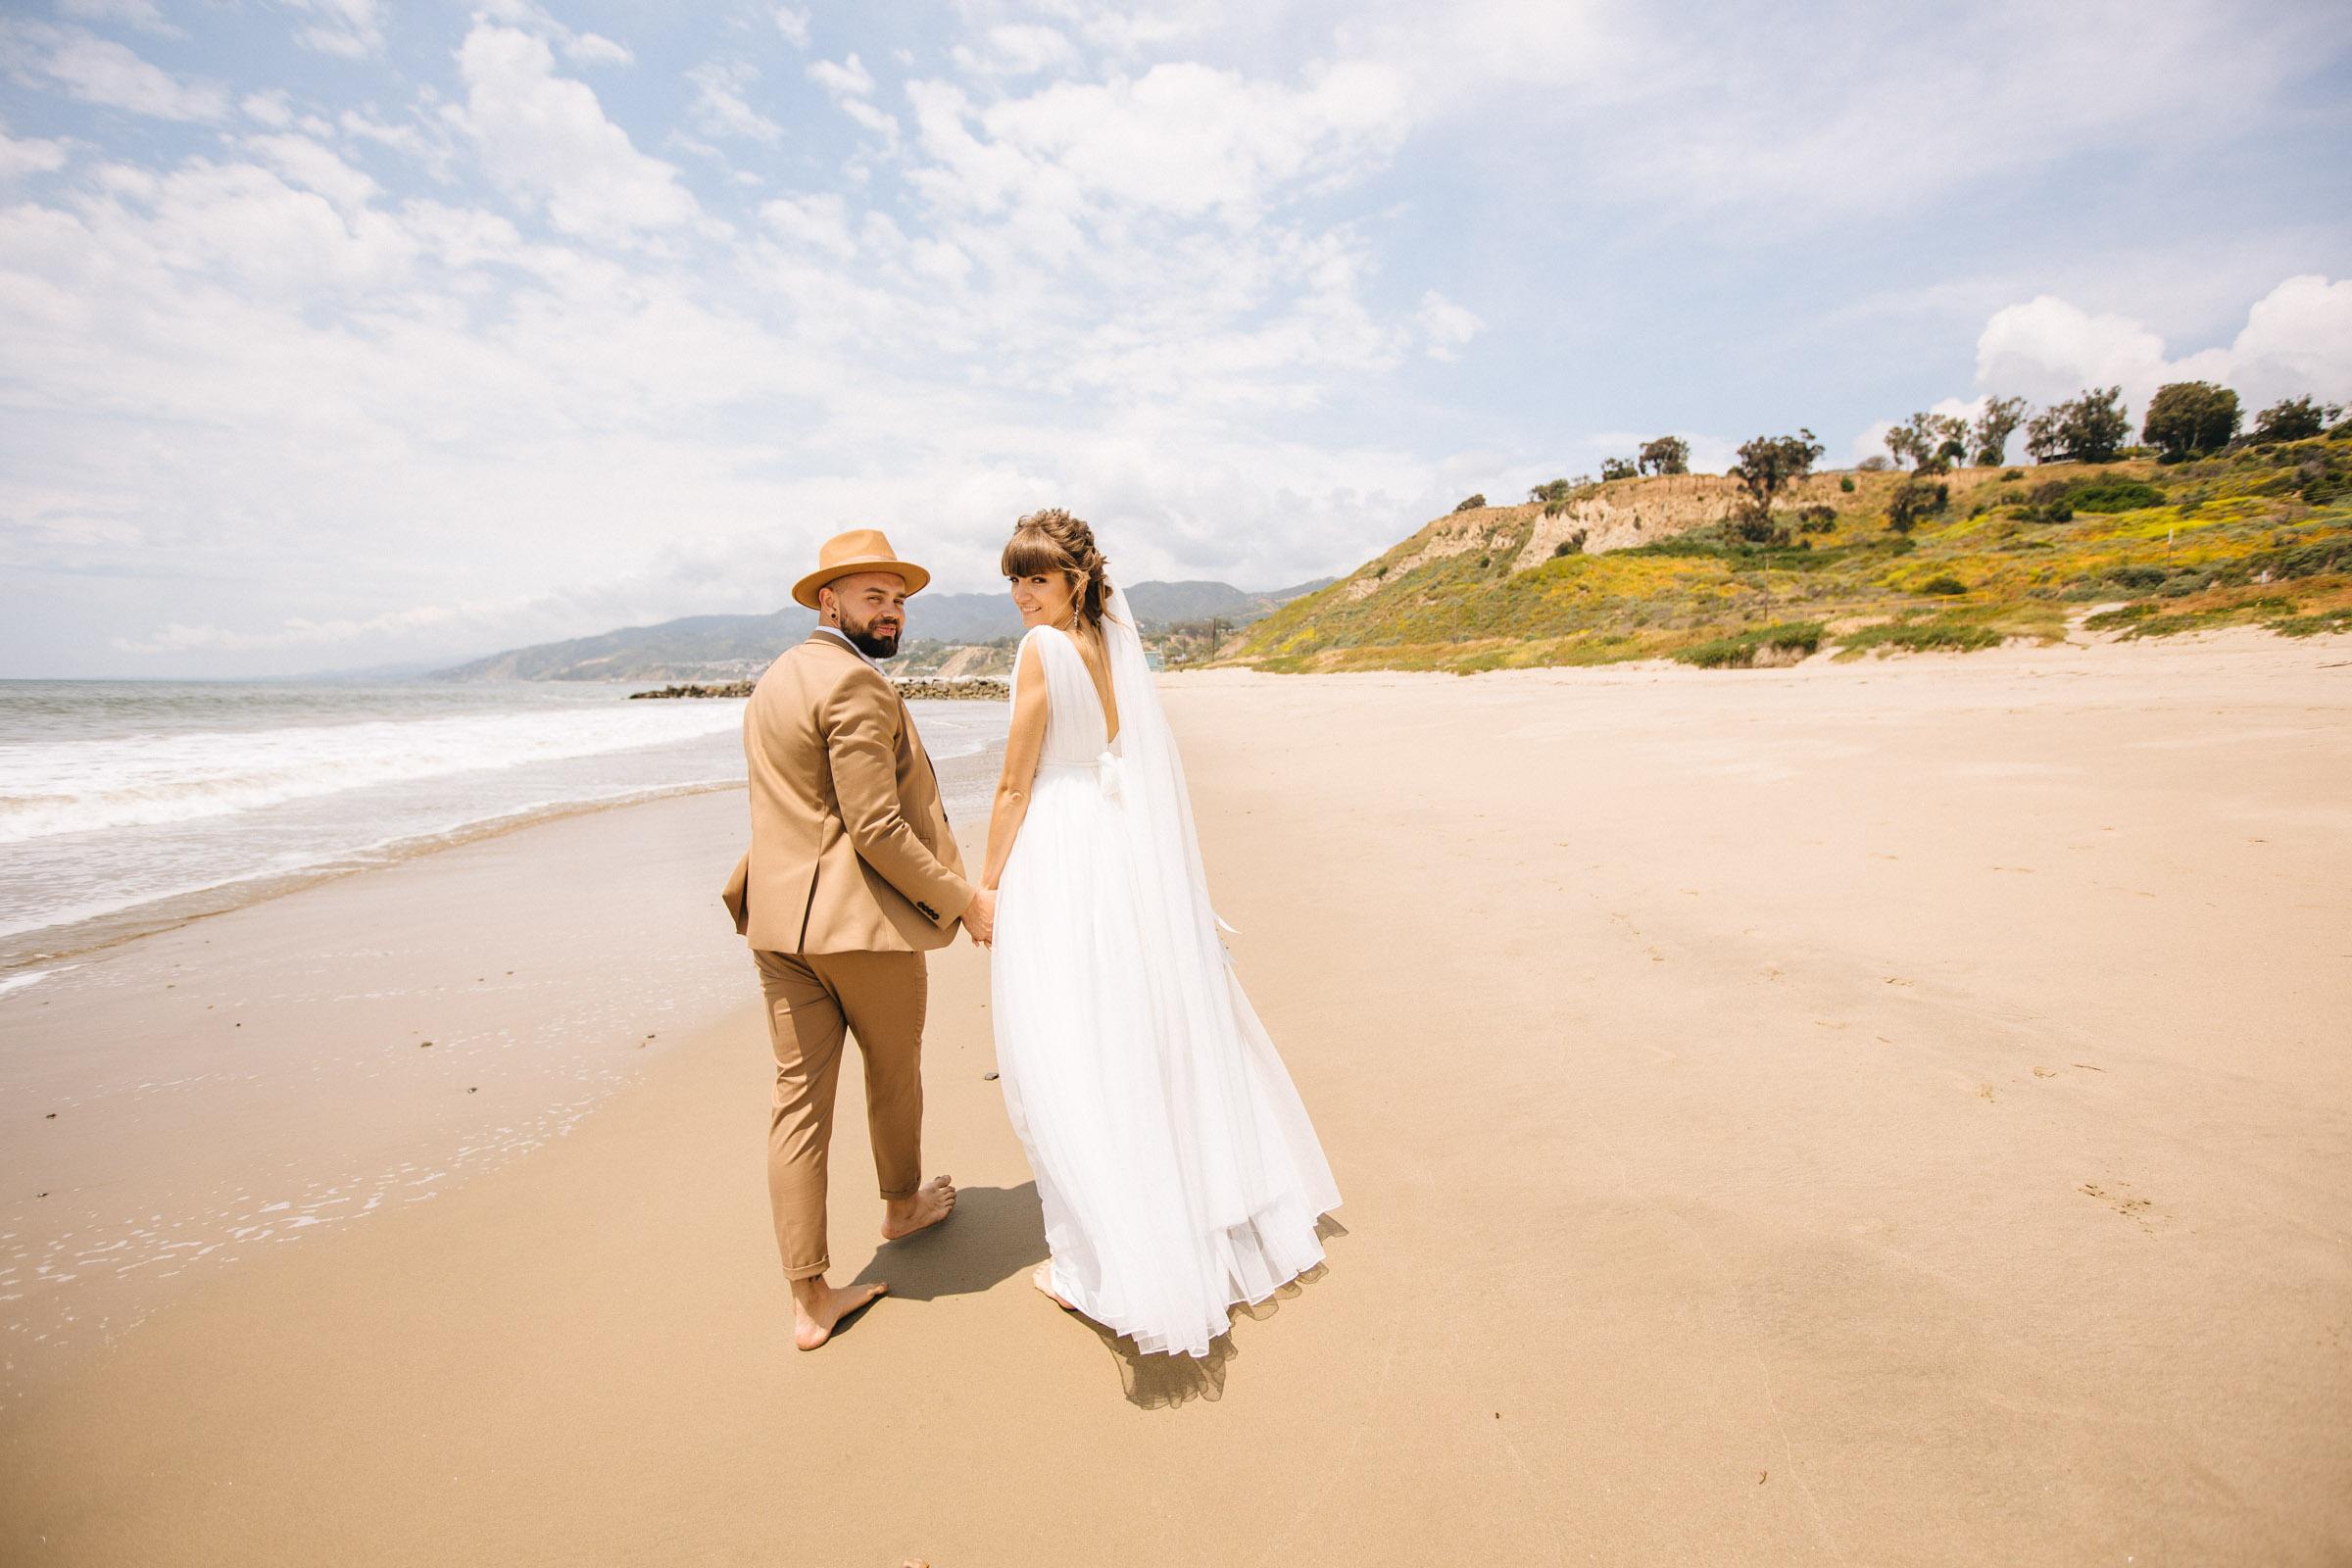 Wedding photographer Los Angeles _ Bride